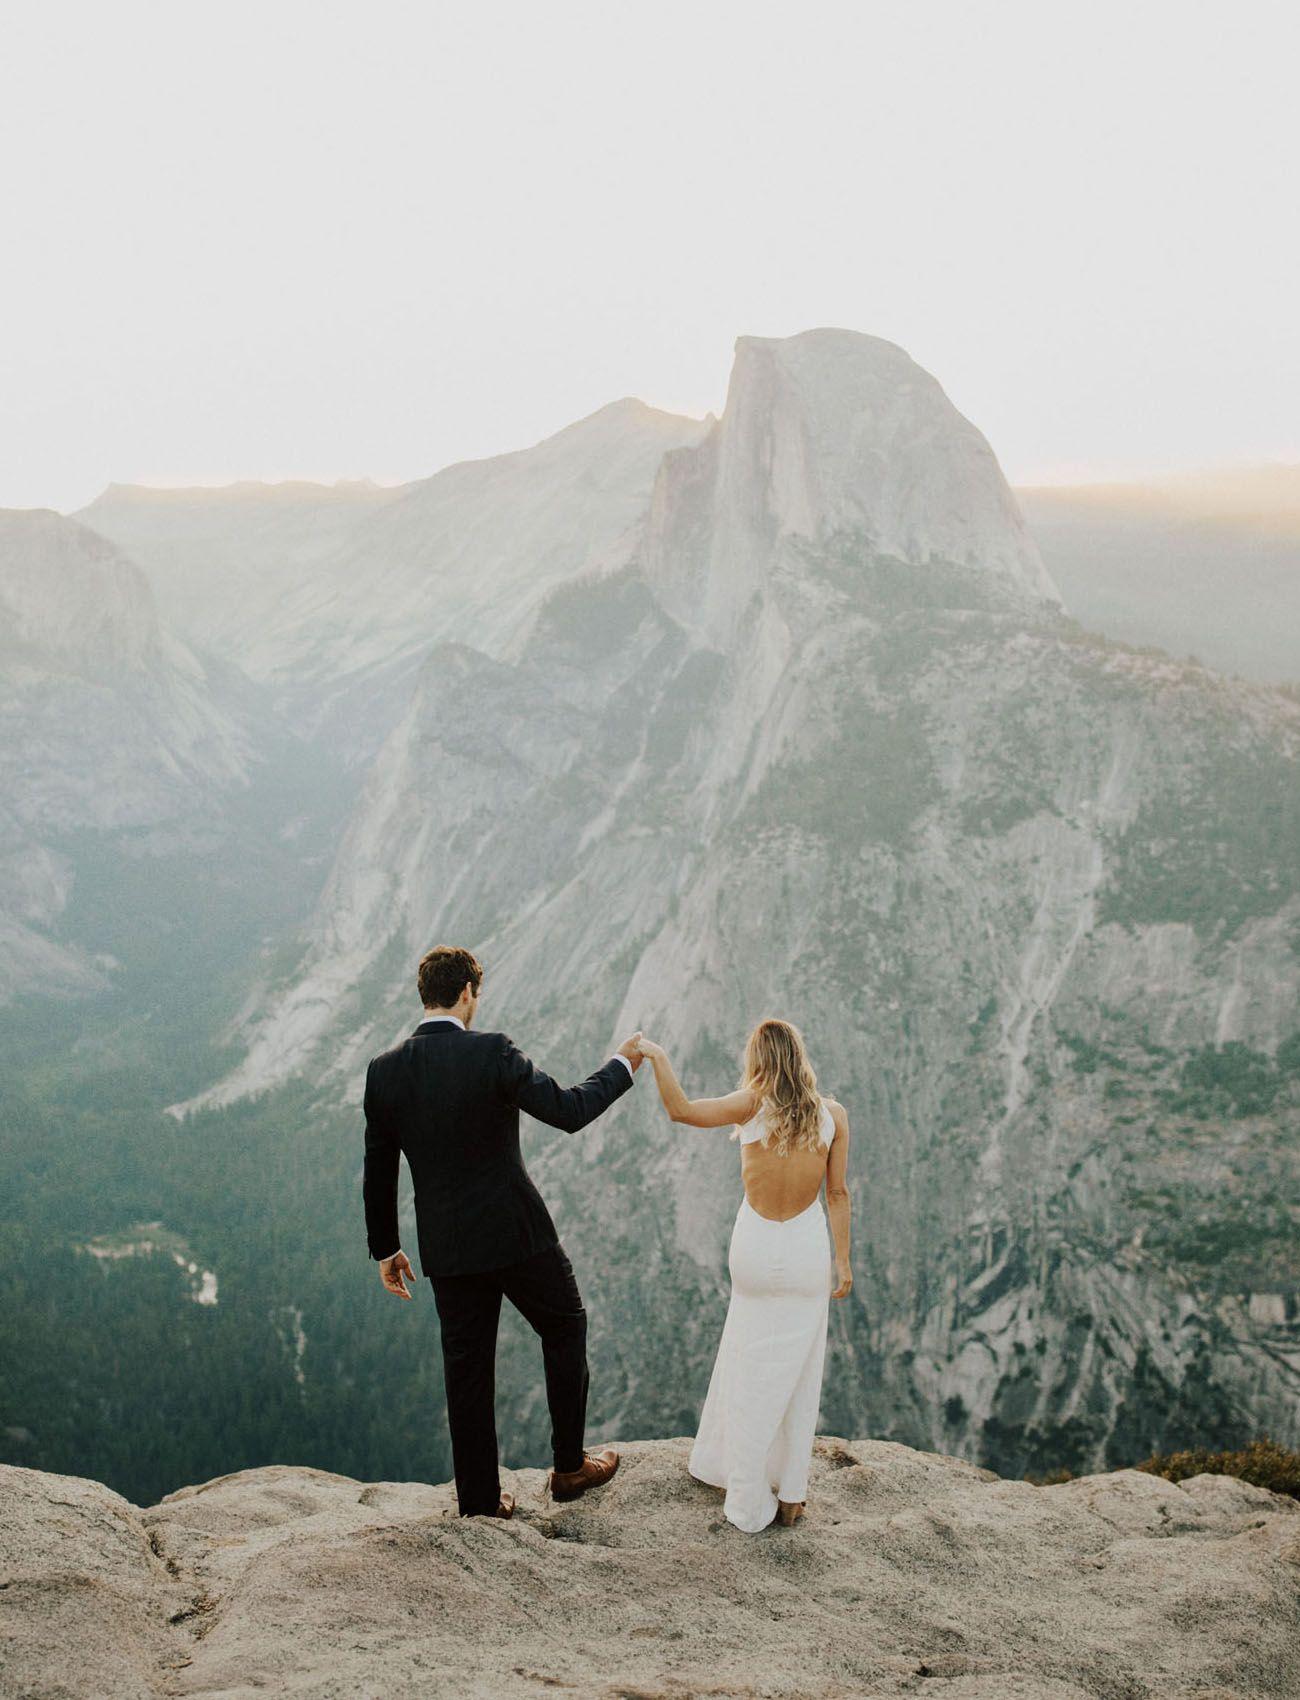 Yosemite Wedding With A Stunning First Look At Glacier Point Green Wedding Shoes Yosemite Wedding Campground Wedding Yosemite